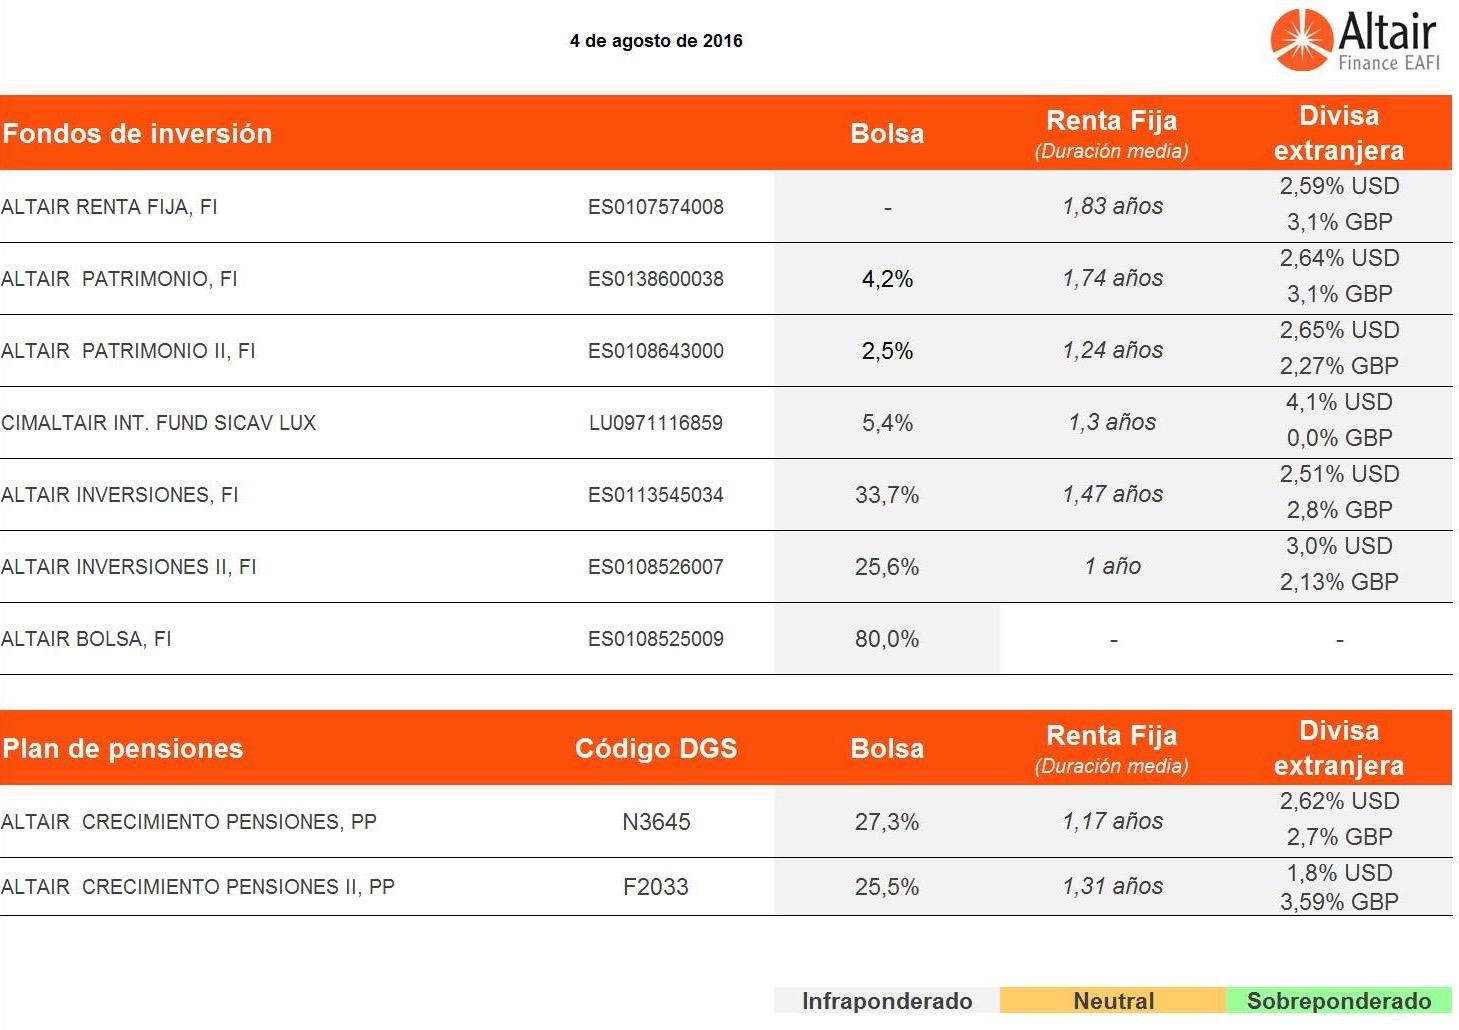 Posicionamiento-fondos-asesorados-Altair-Finance-8-agosto-2016